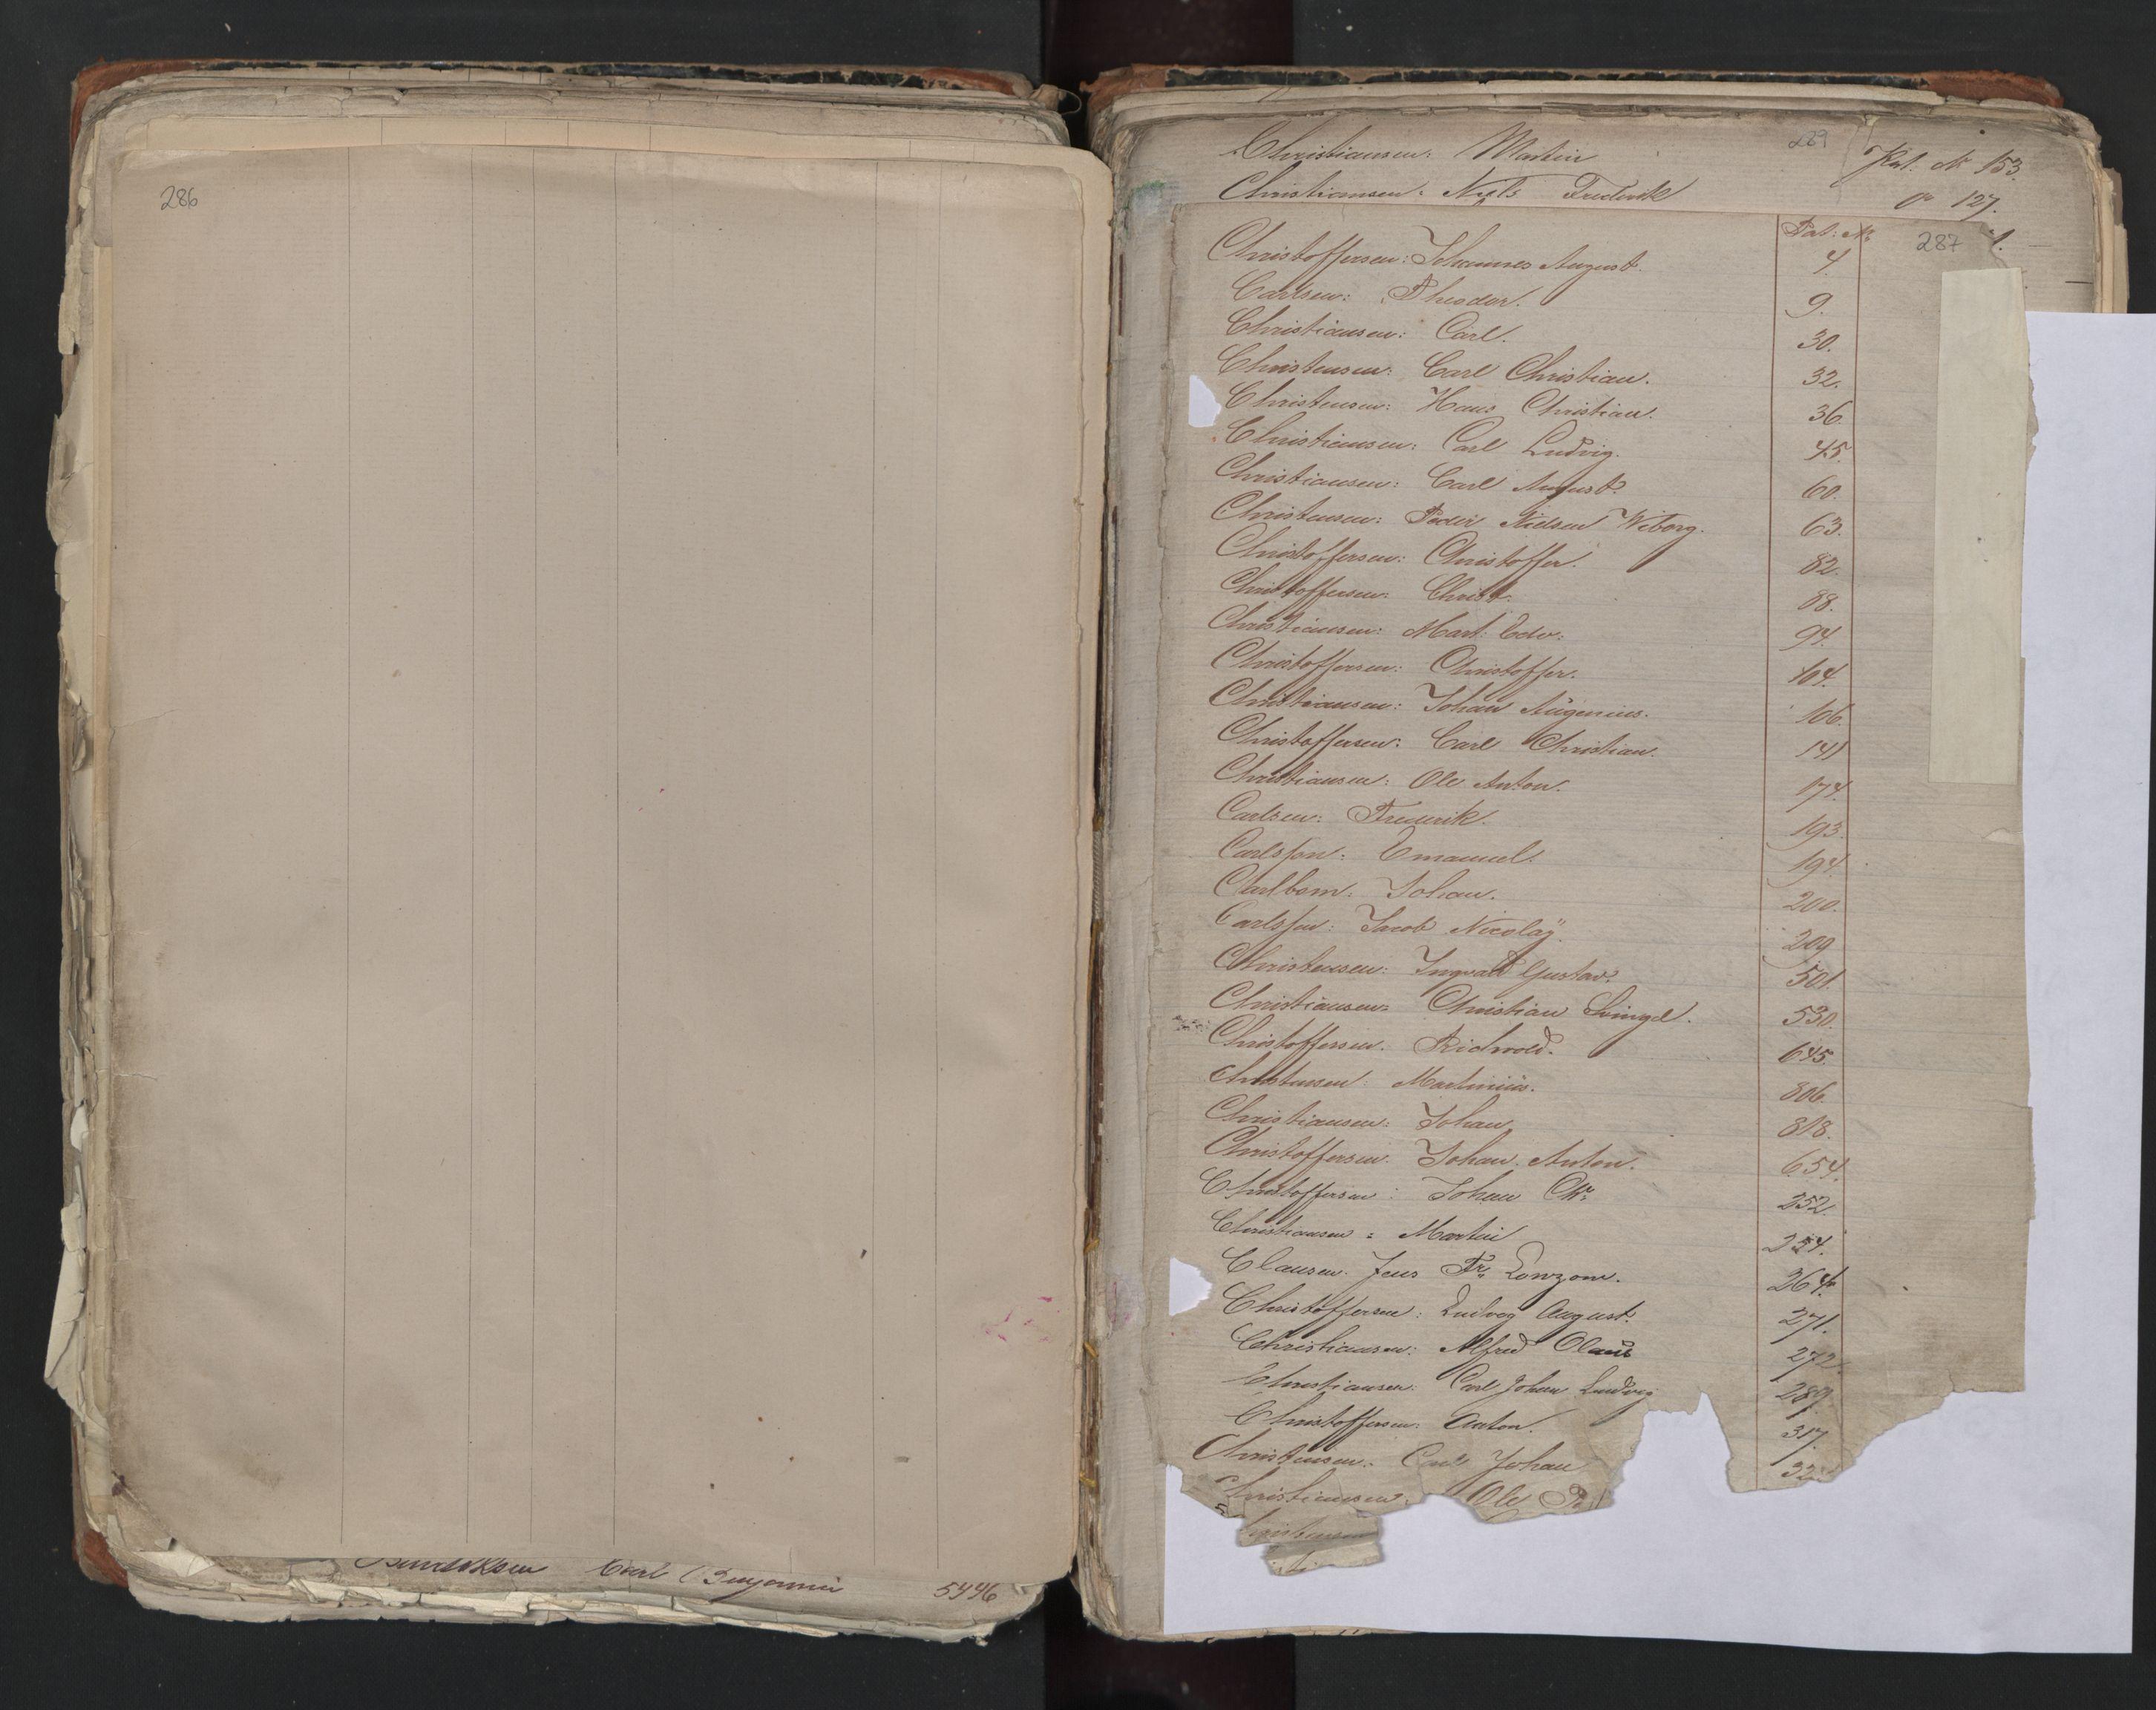 SAO, Oslo sjømannskontor, F/Fa/L0001: Register for Kristiania krets, 1866-1891, s. 286-287